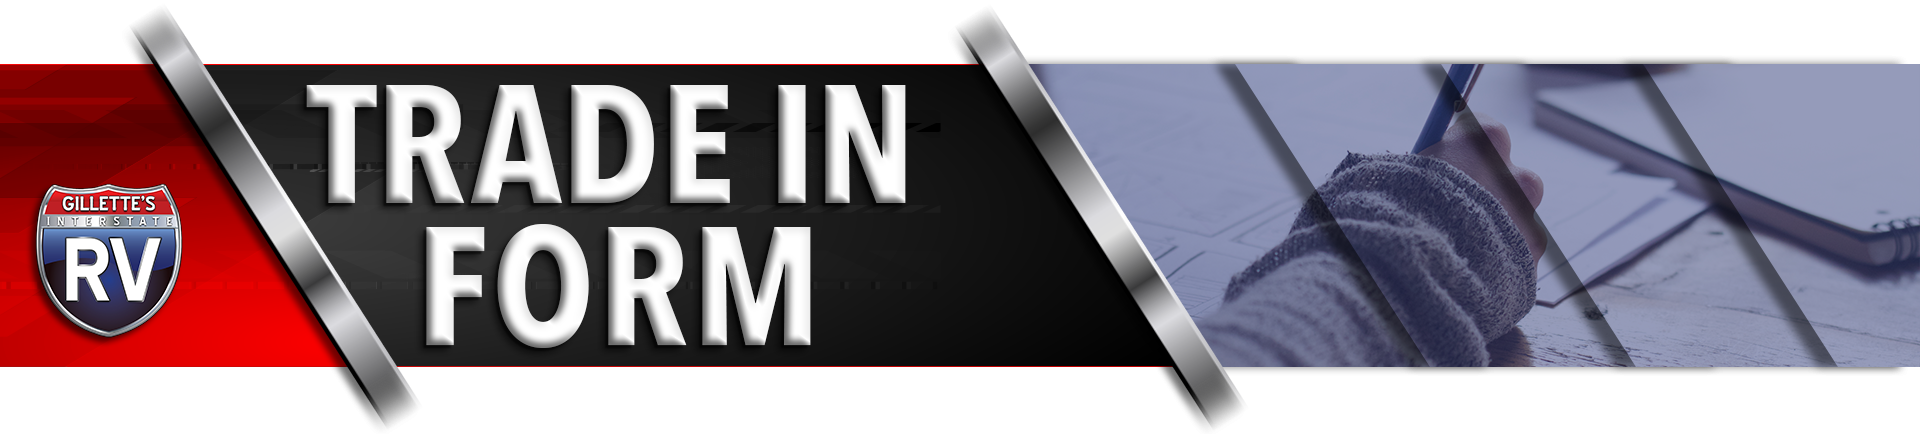 RV Trade In Form at Gillette's Interstate RV